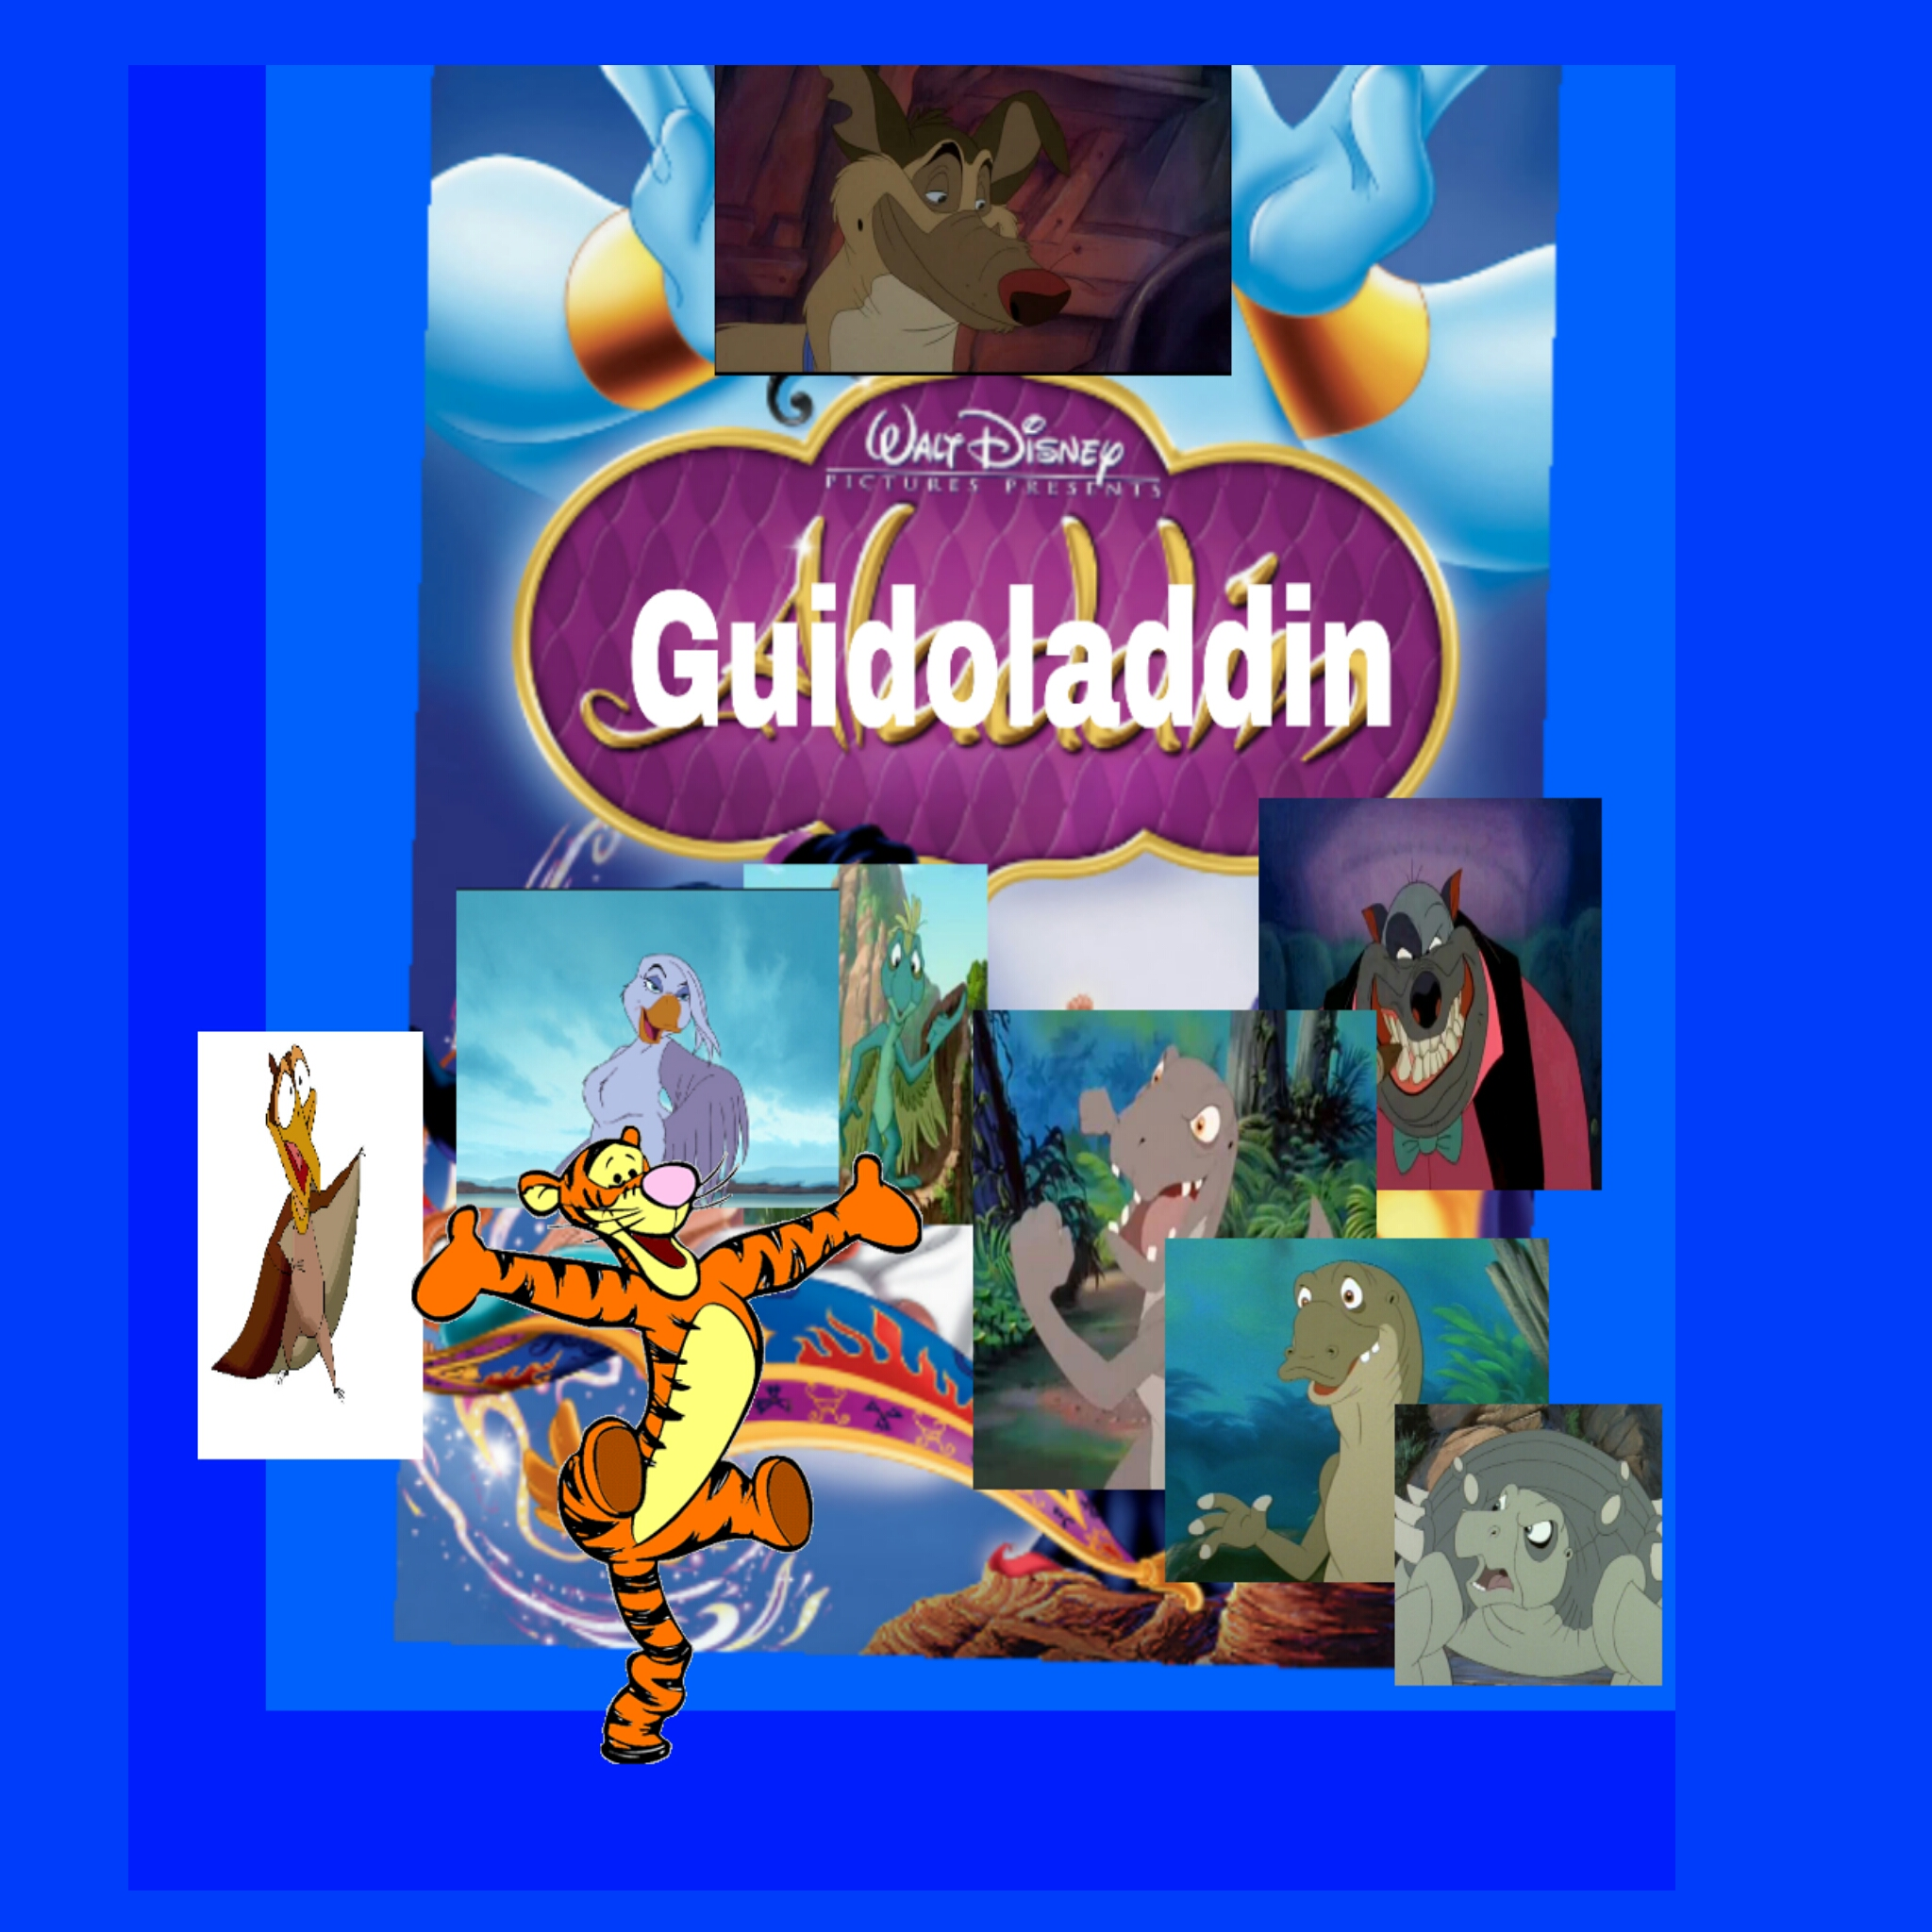 Guidoladdin